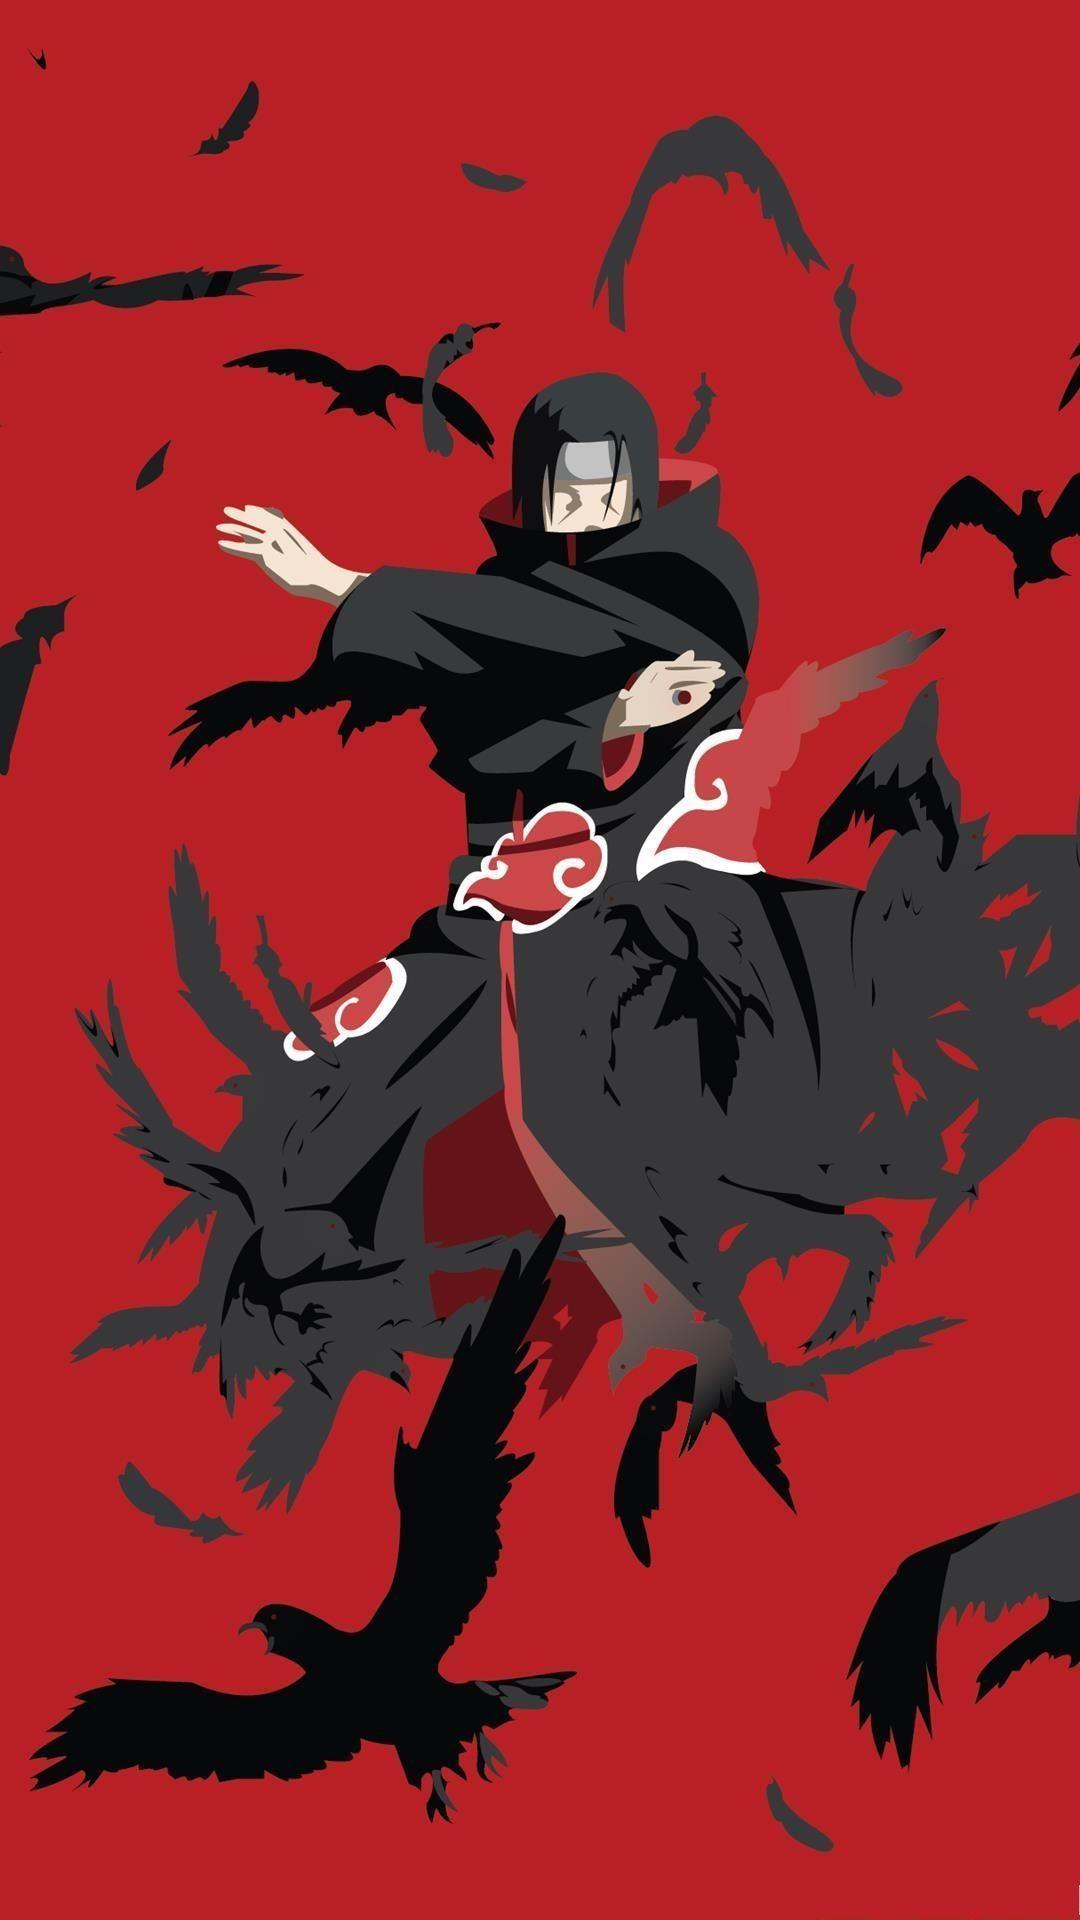 Naruto Death Wallpapers - Top Free Naruto Death ...